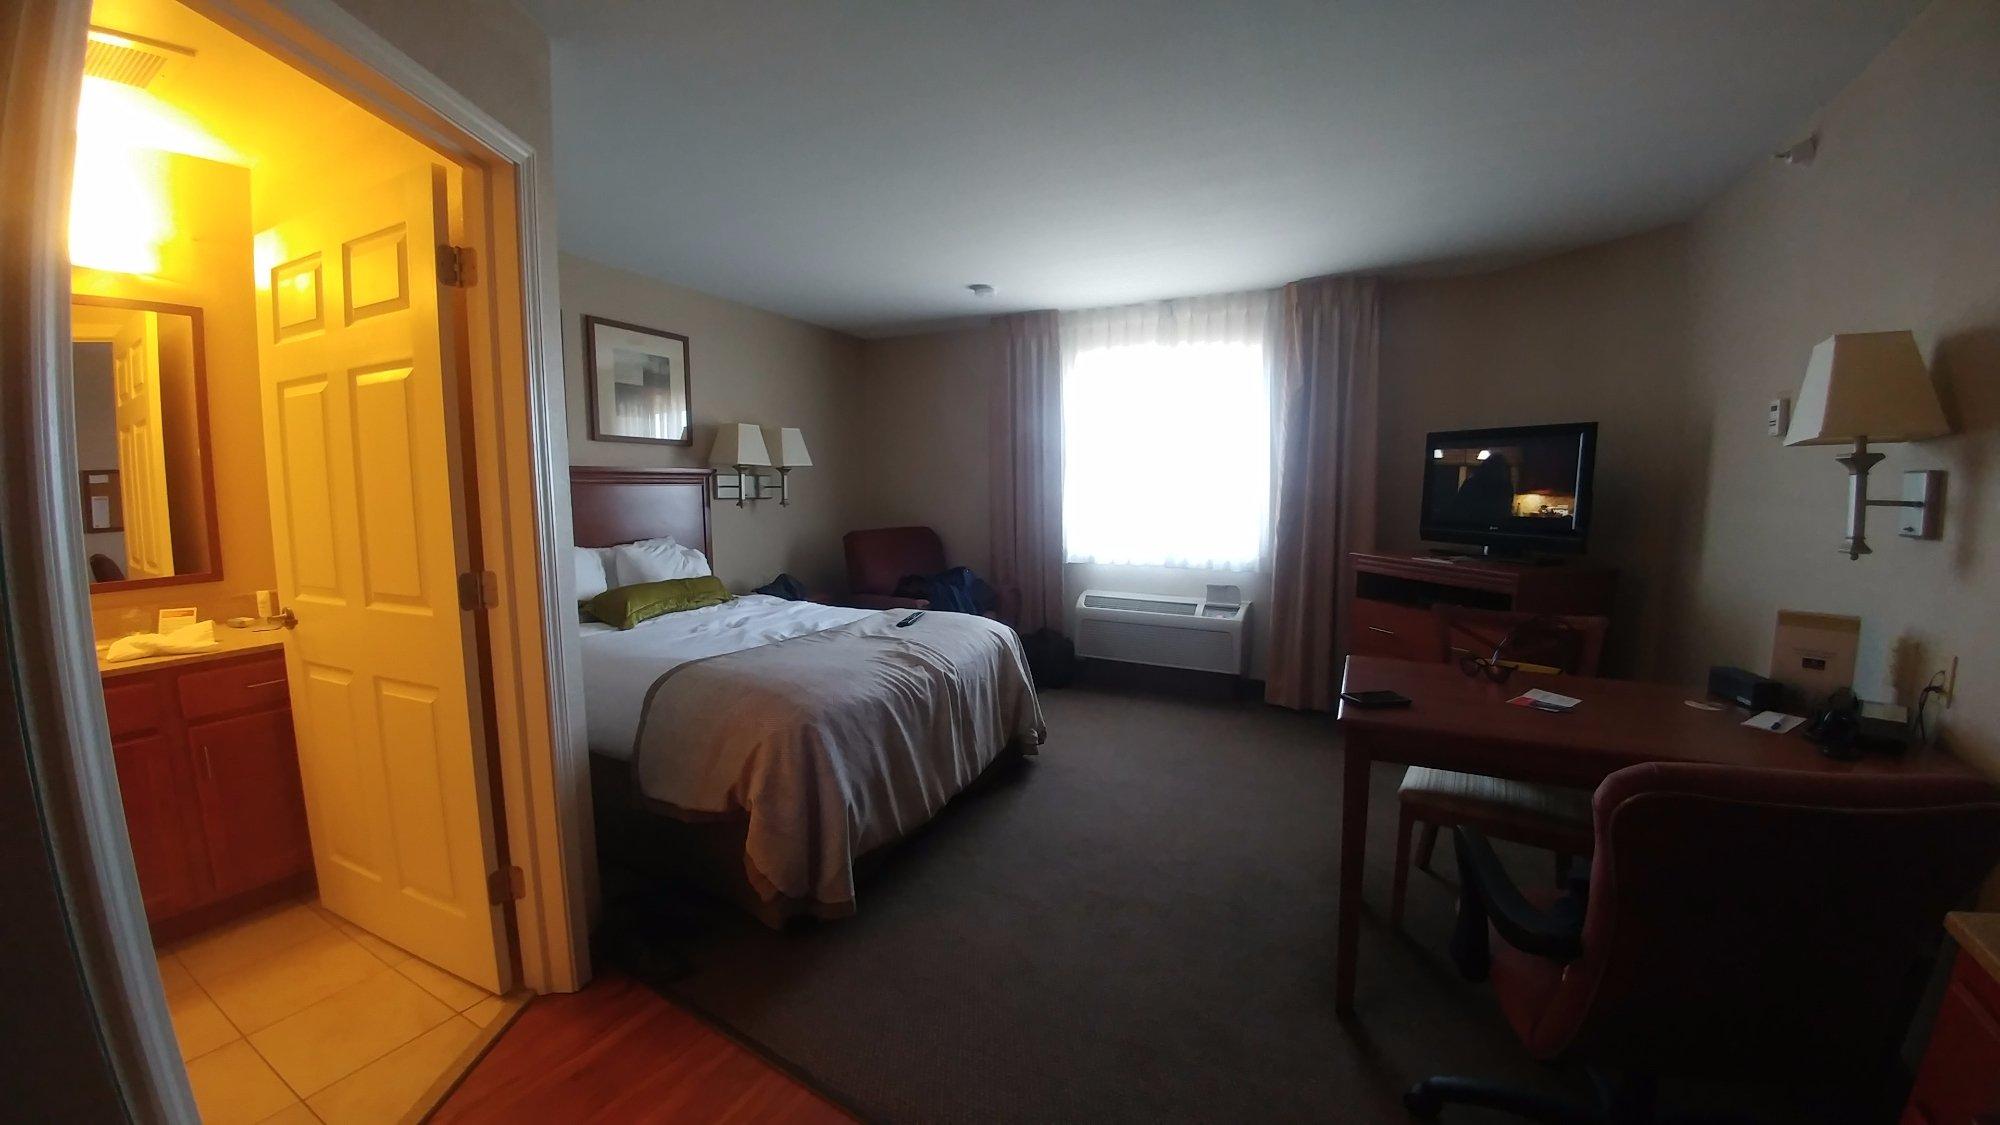 Candlewood Suites Indianapolis Northwest